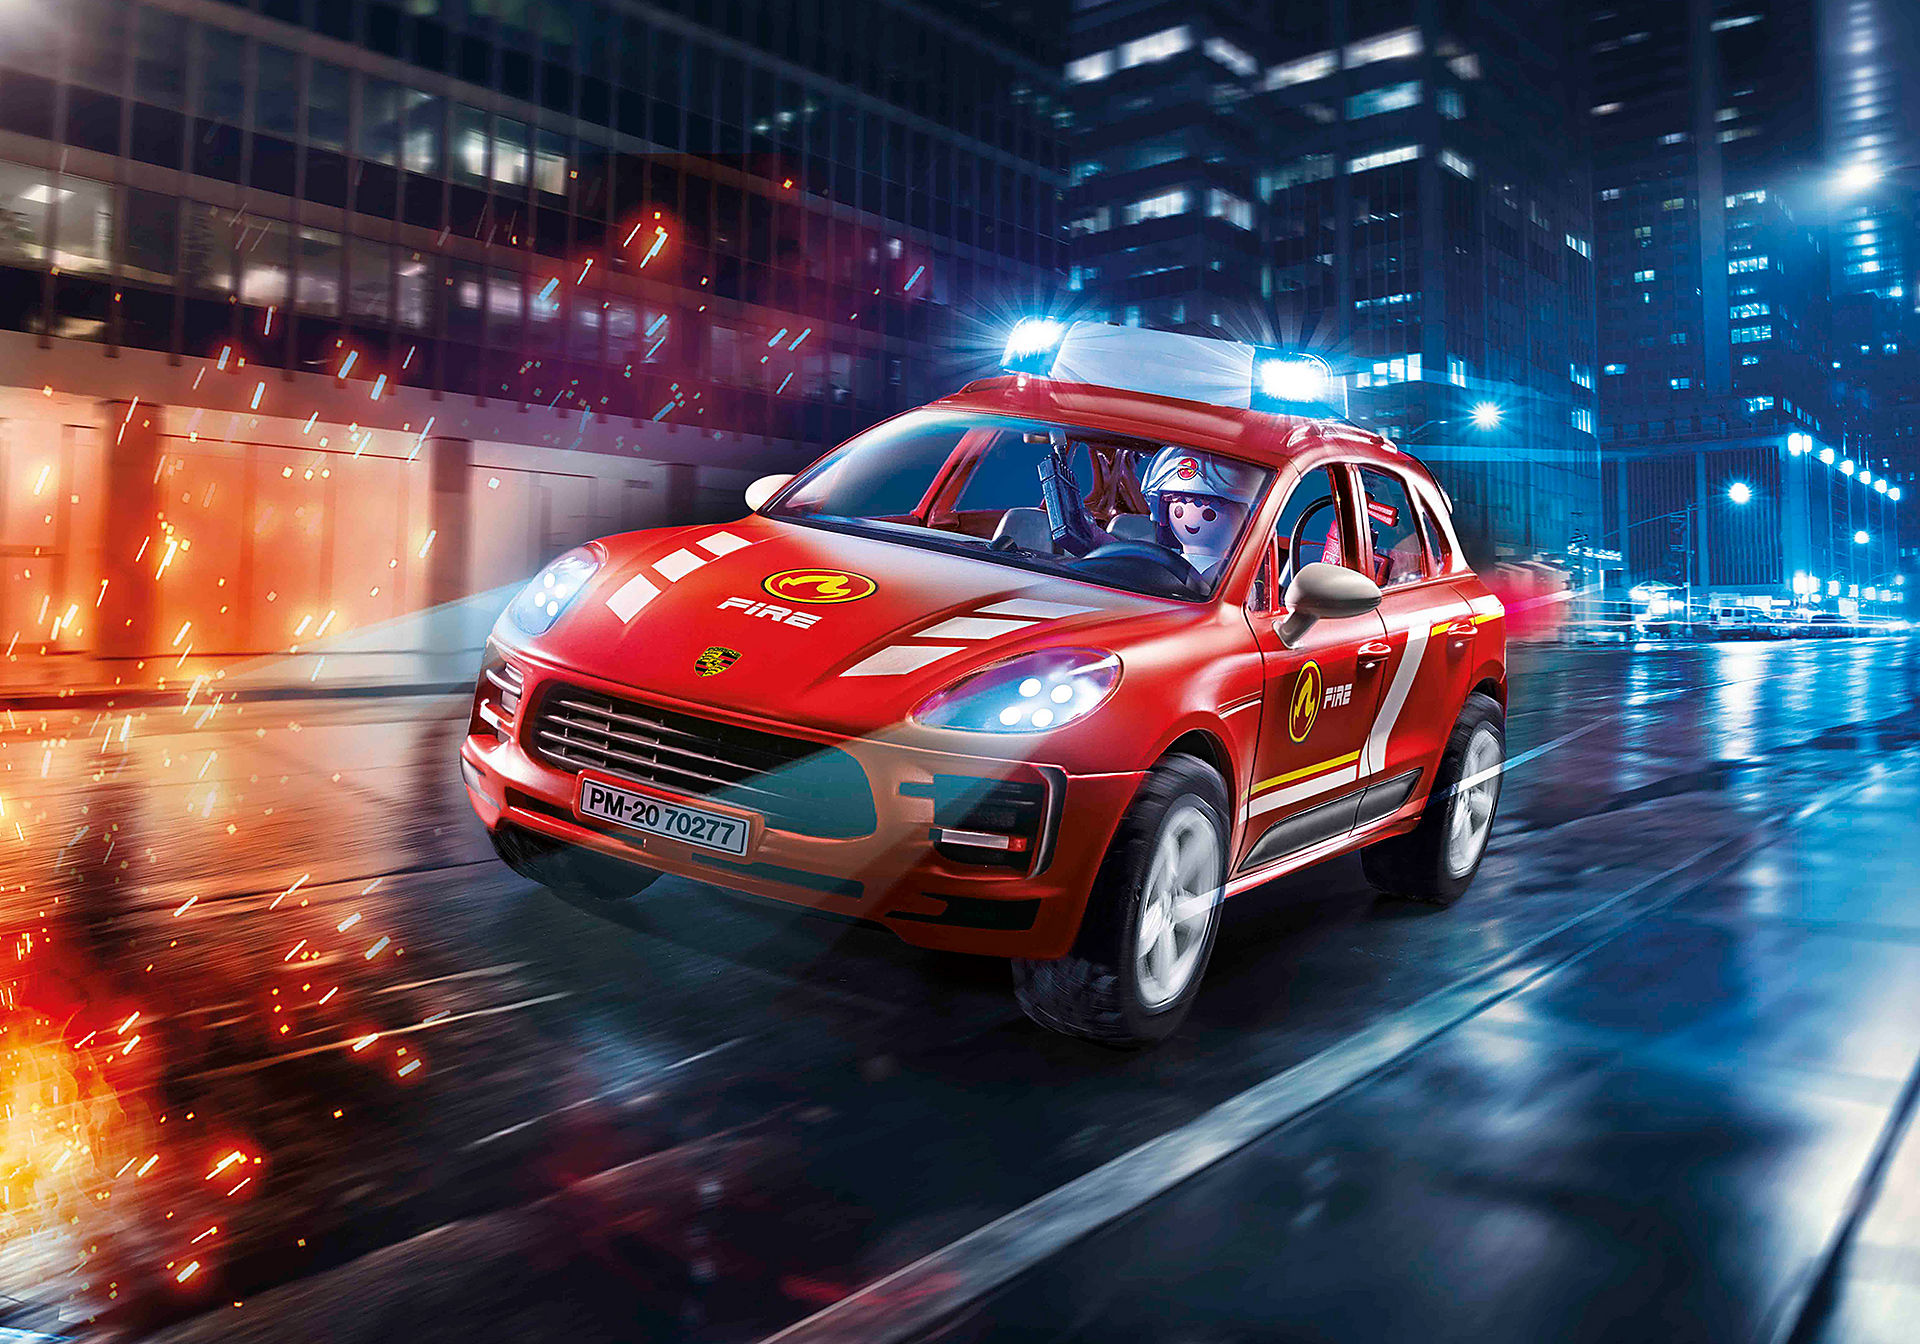 70277 Porsche Macan Fire Brigade zoom image1